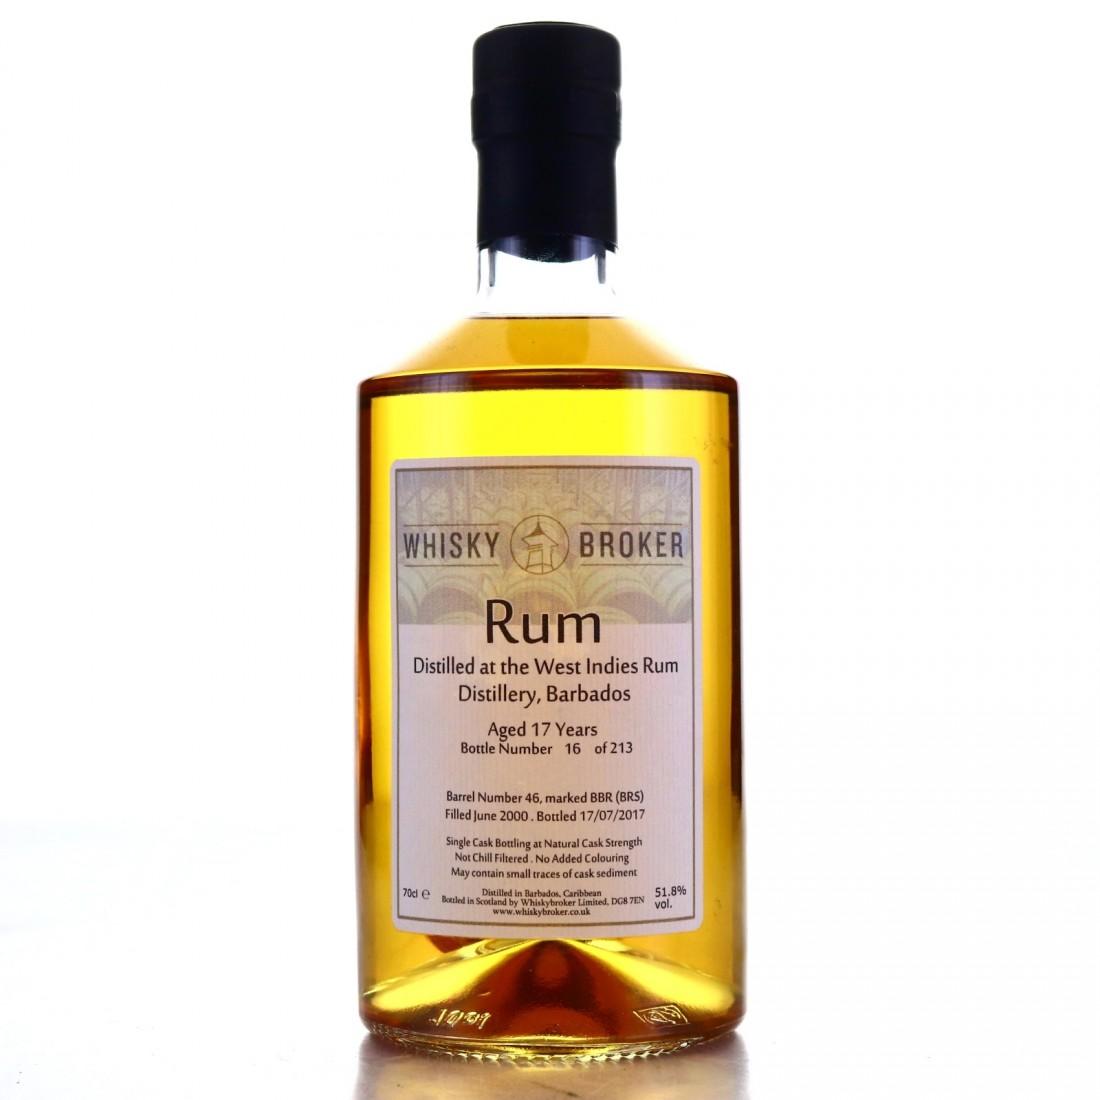 WIRD 2000 Whisky Broker 17 Year Old